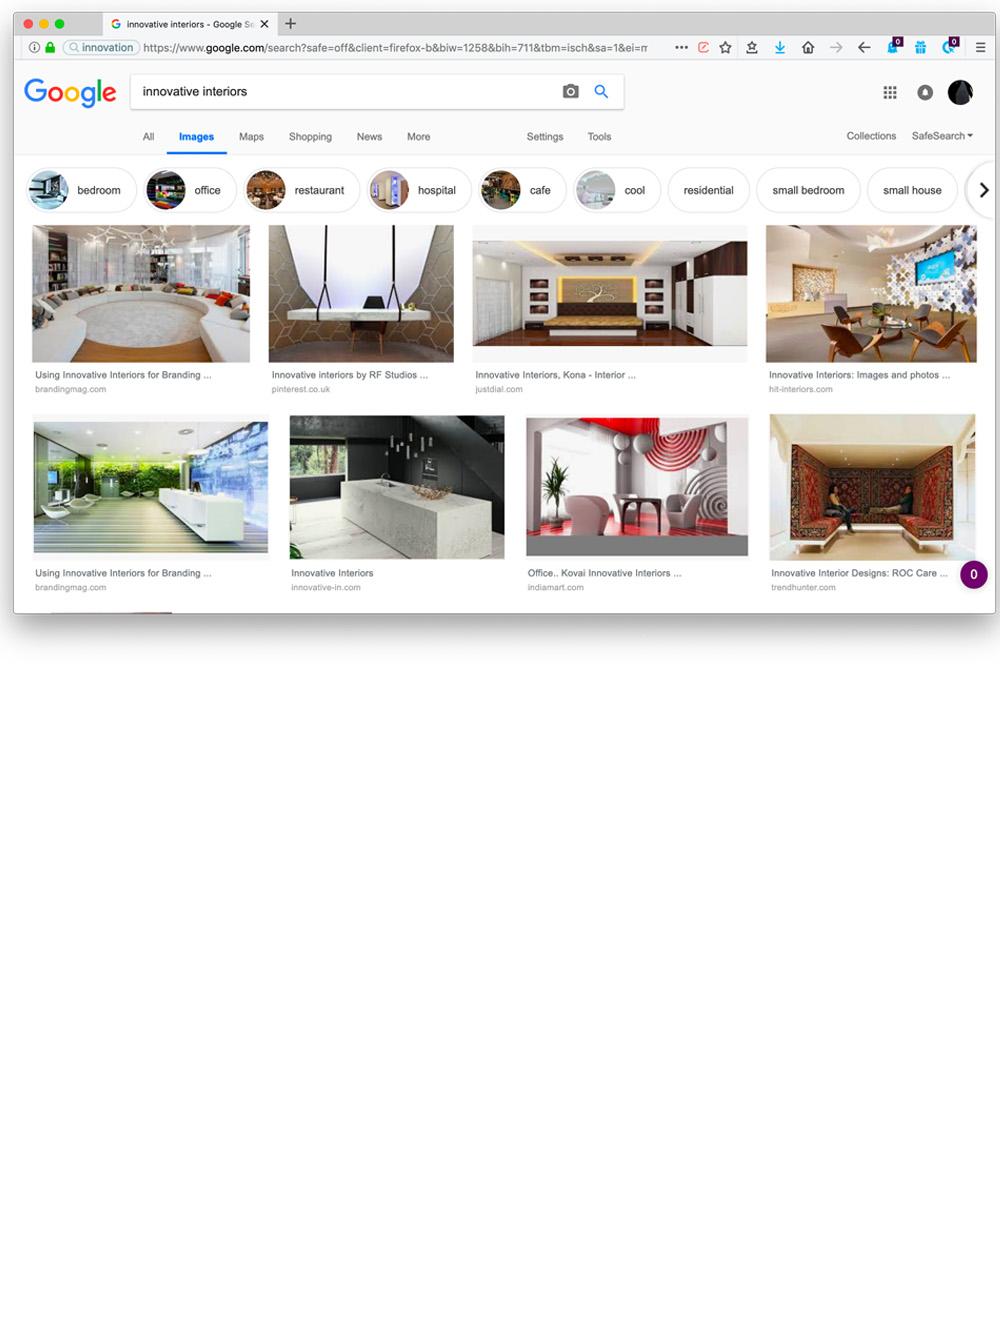 Innovative Interior (website image)